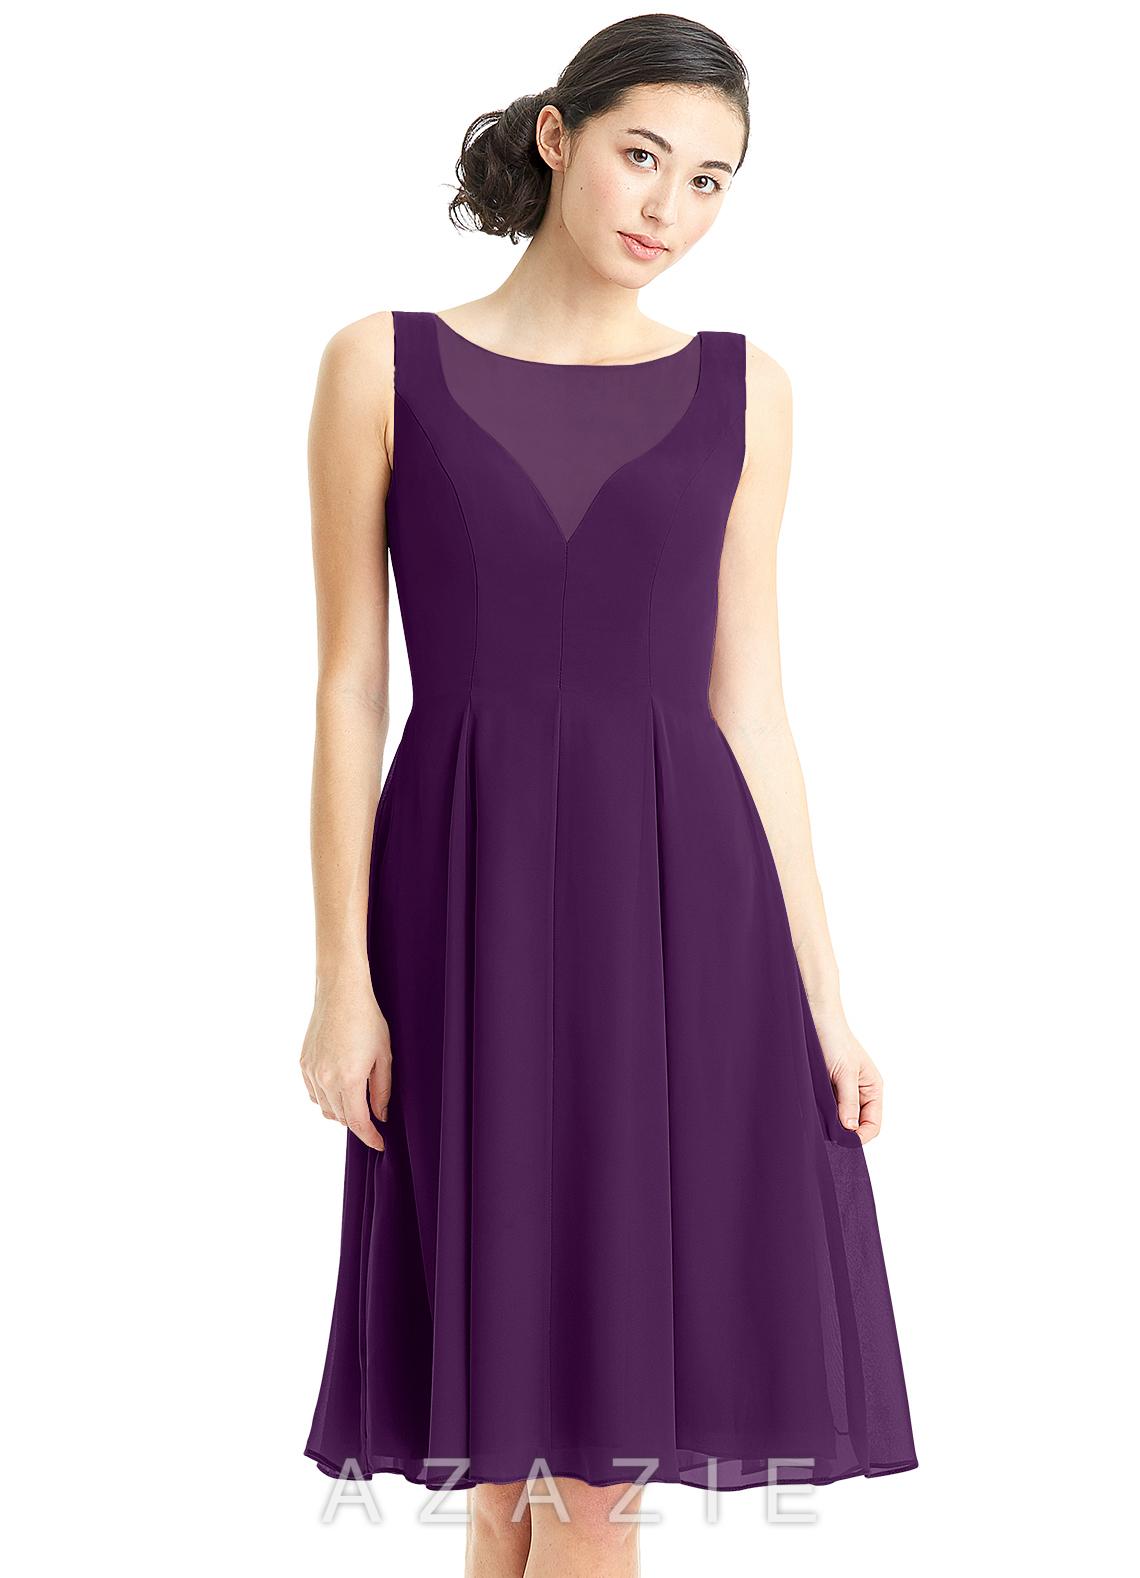 Azazie Kaya Bridesmaid Dress   Azazie